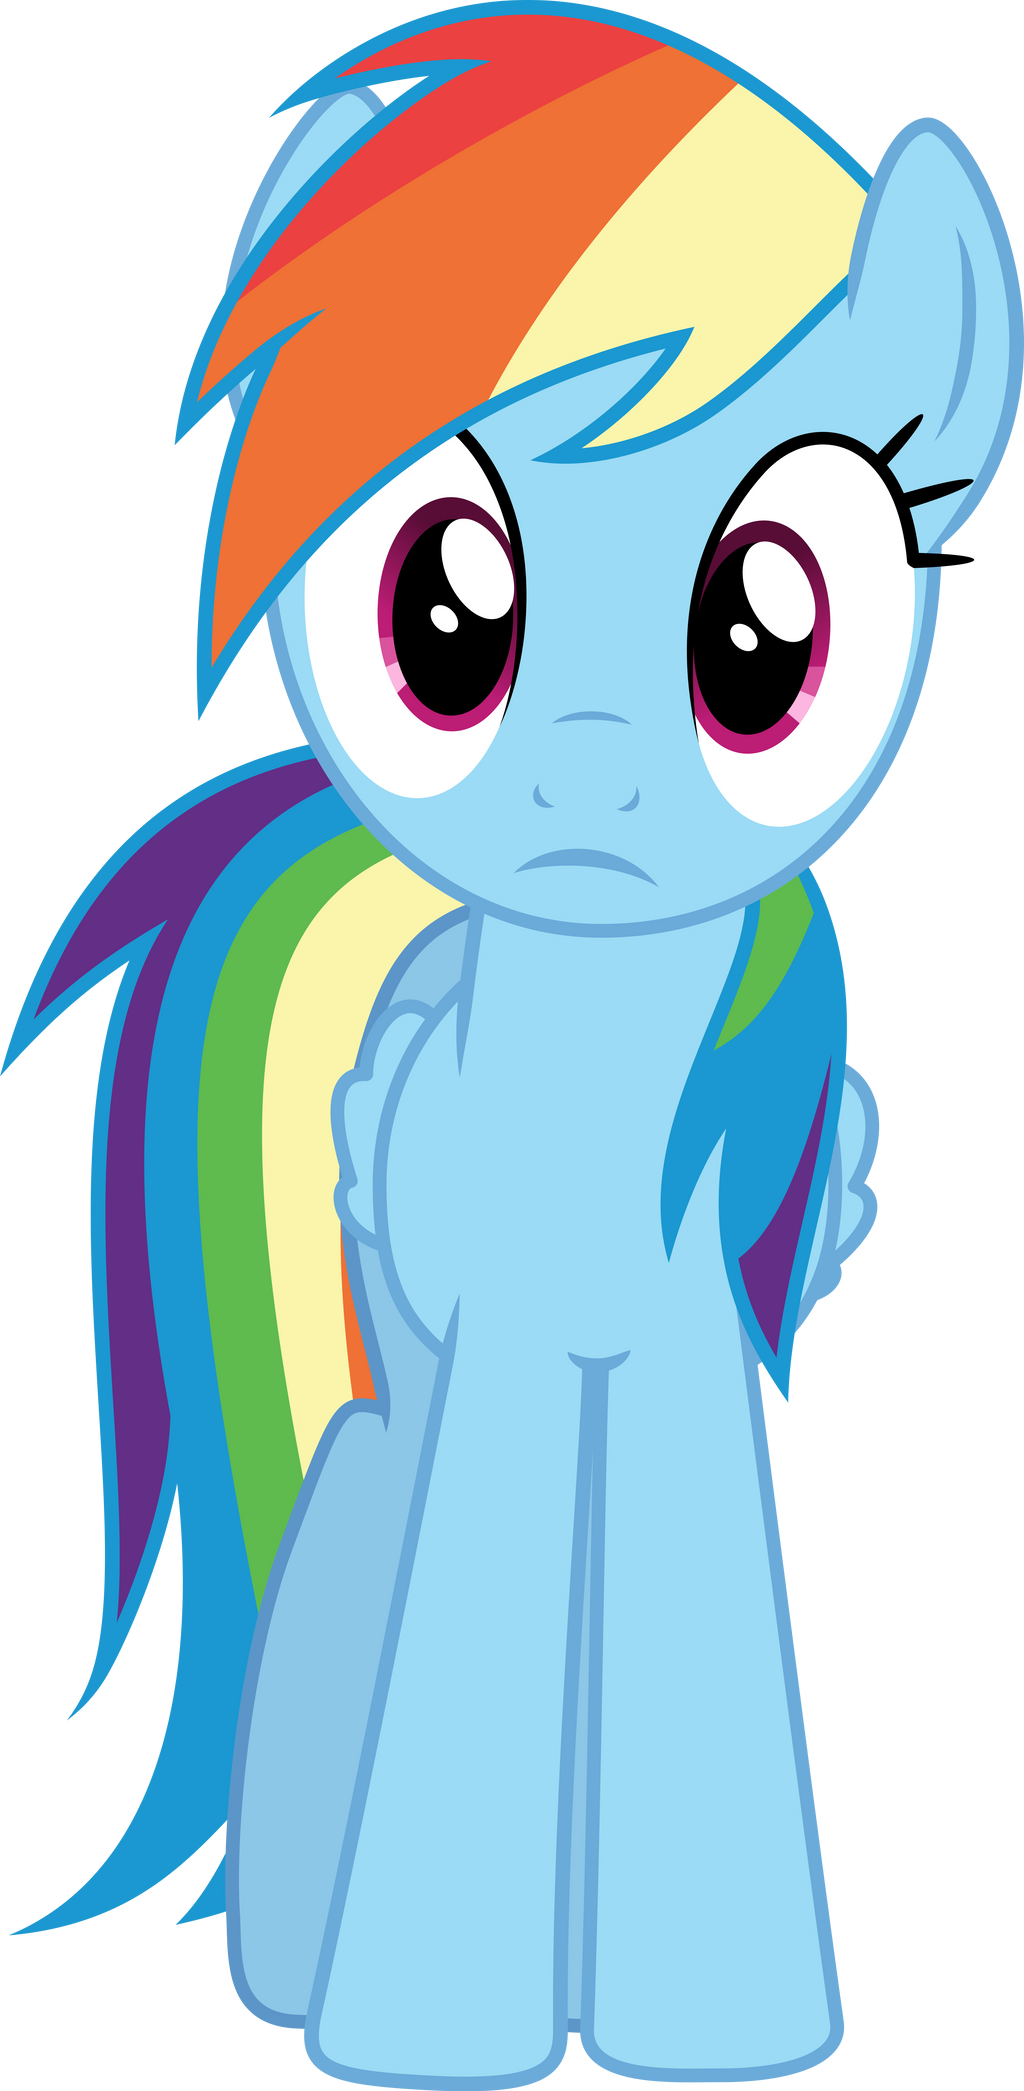 Rainbow Dash stare by Dusk2k